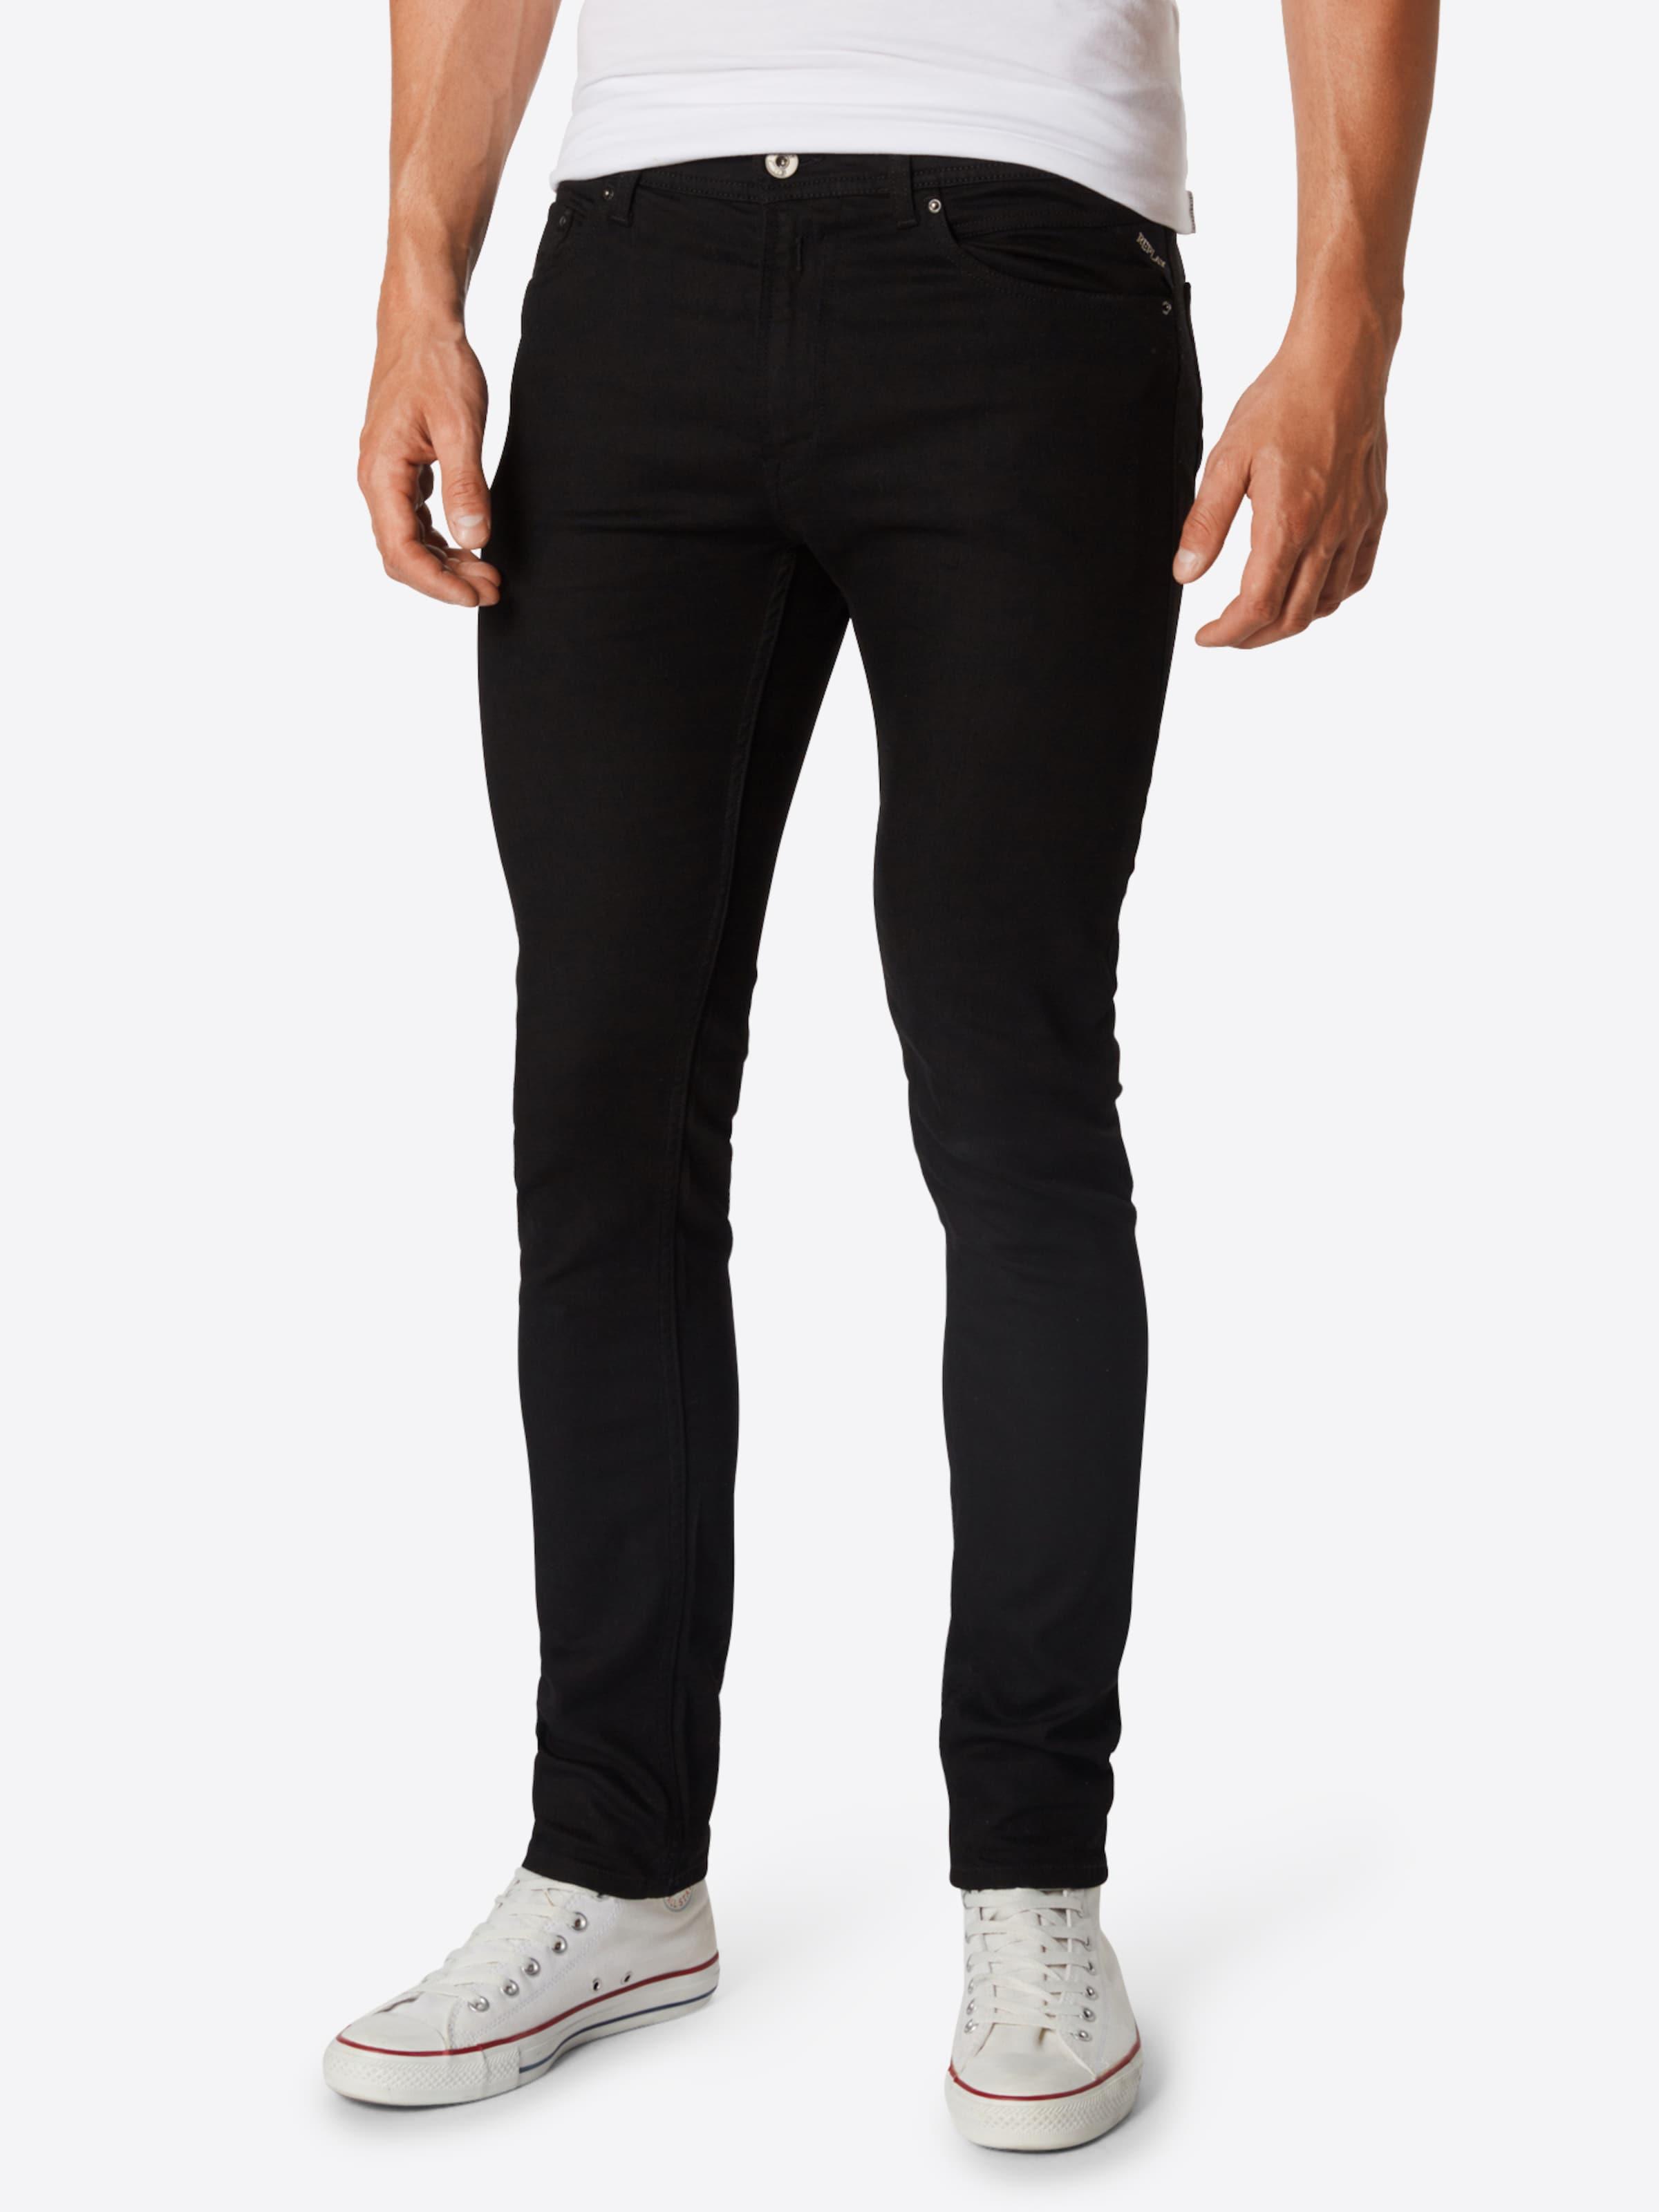 Jeans Replay In Replay 'jondrill' 'jondrill' Jeans Jeans Schwarz Schwarz 'jondrill' In Replay shrdtQC